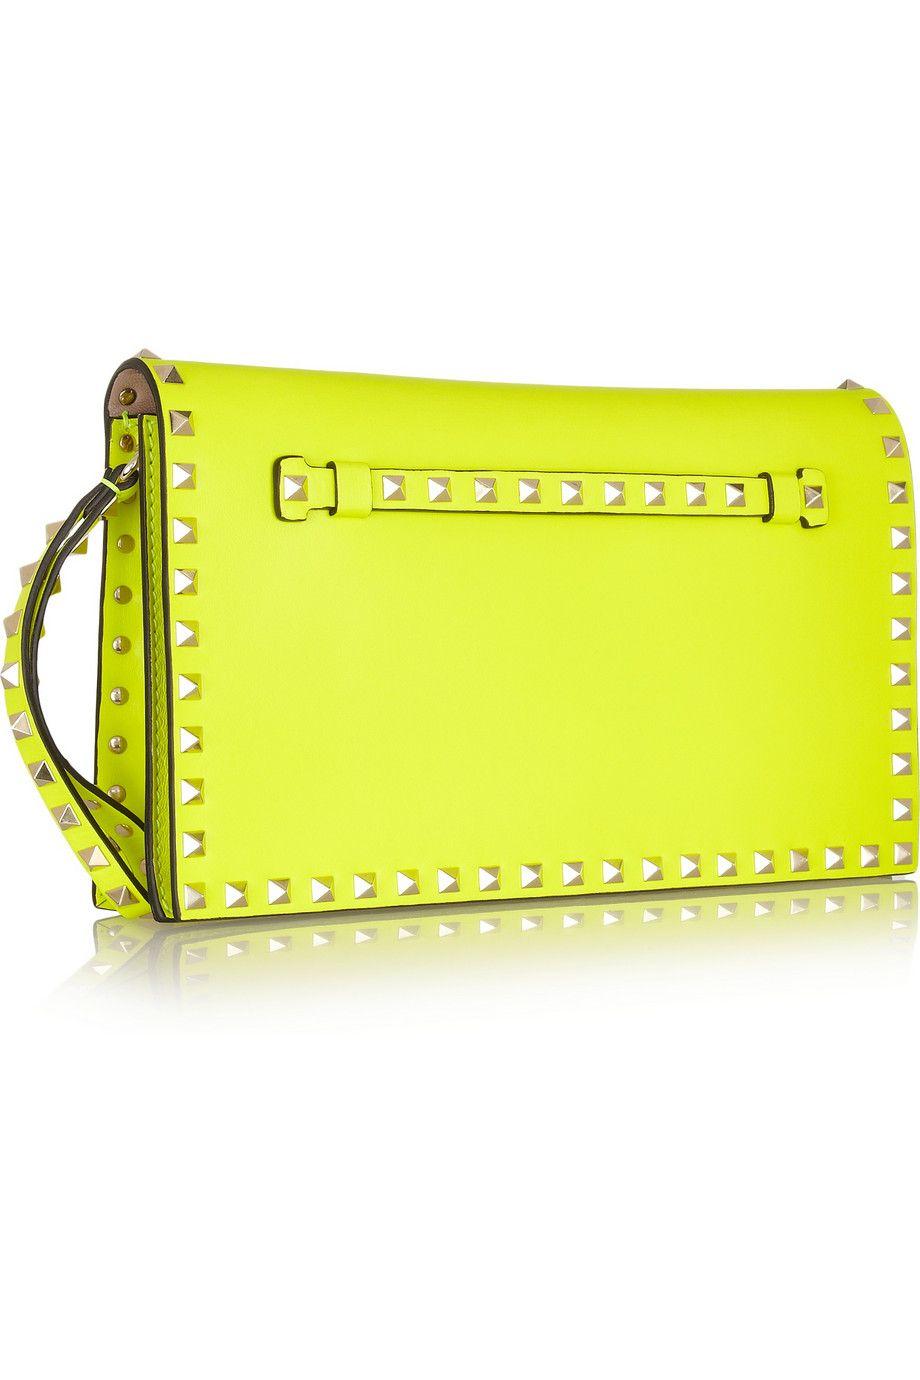 Valentino rockstud neon yellow clutch image inspiration jpg 920x1380 Neon  yellow clutch 0ef901346fa3c